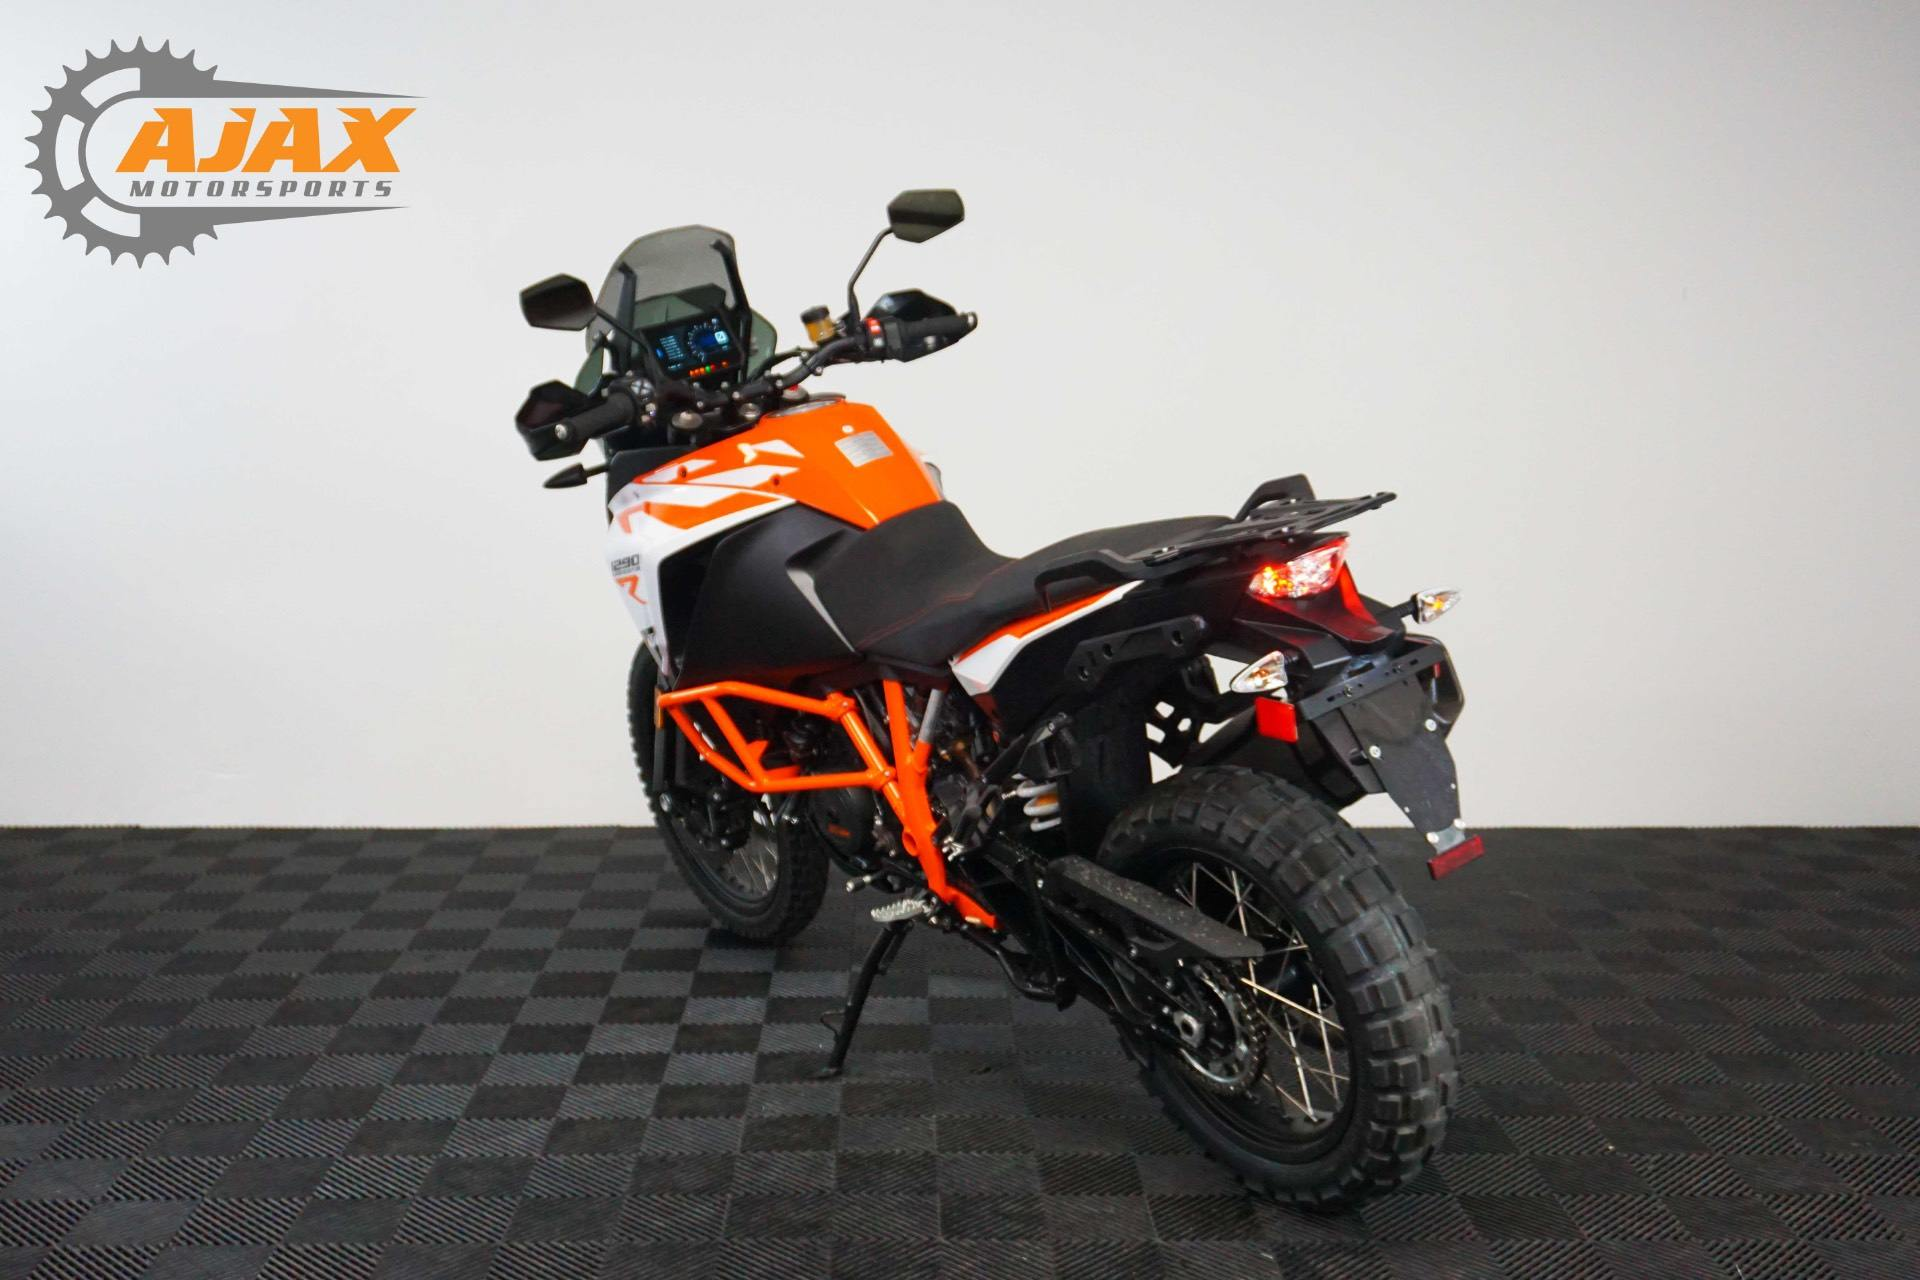 2018 KTM 1290 Super Adventure R 8